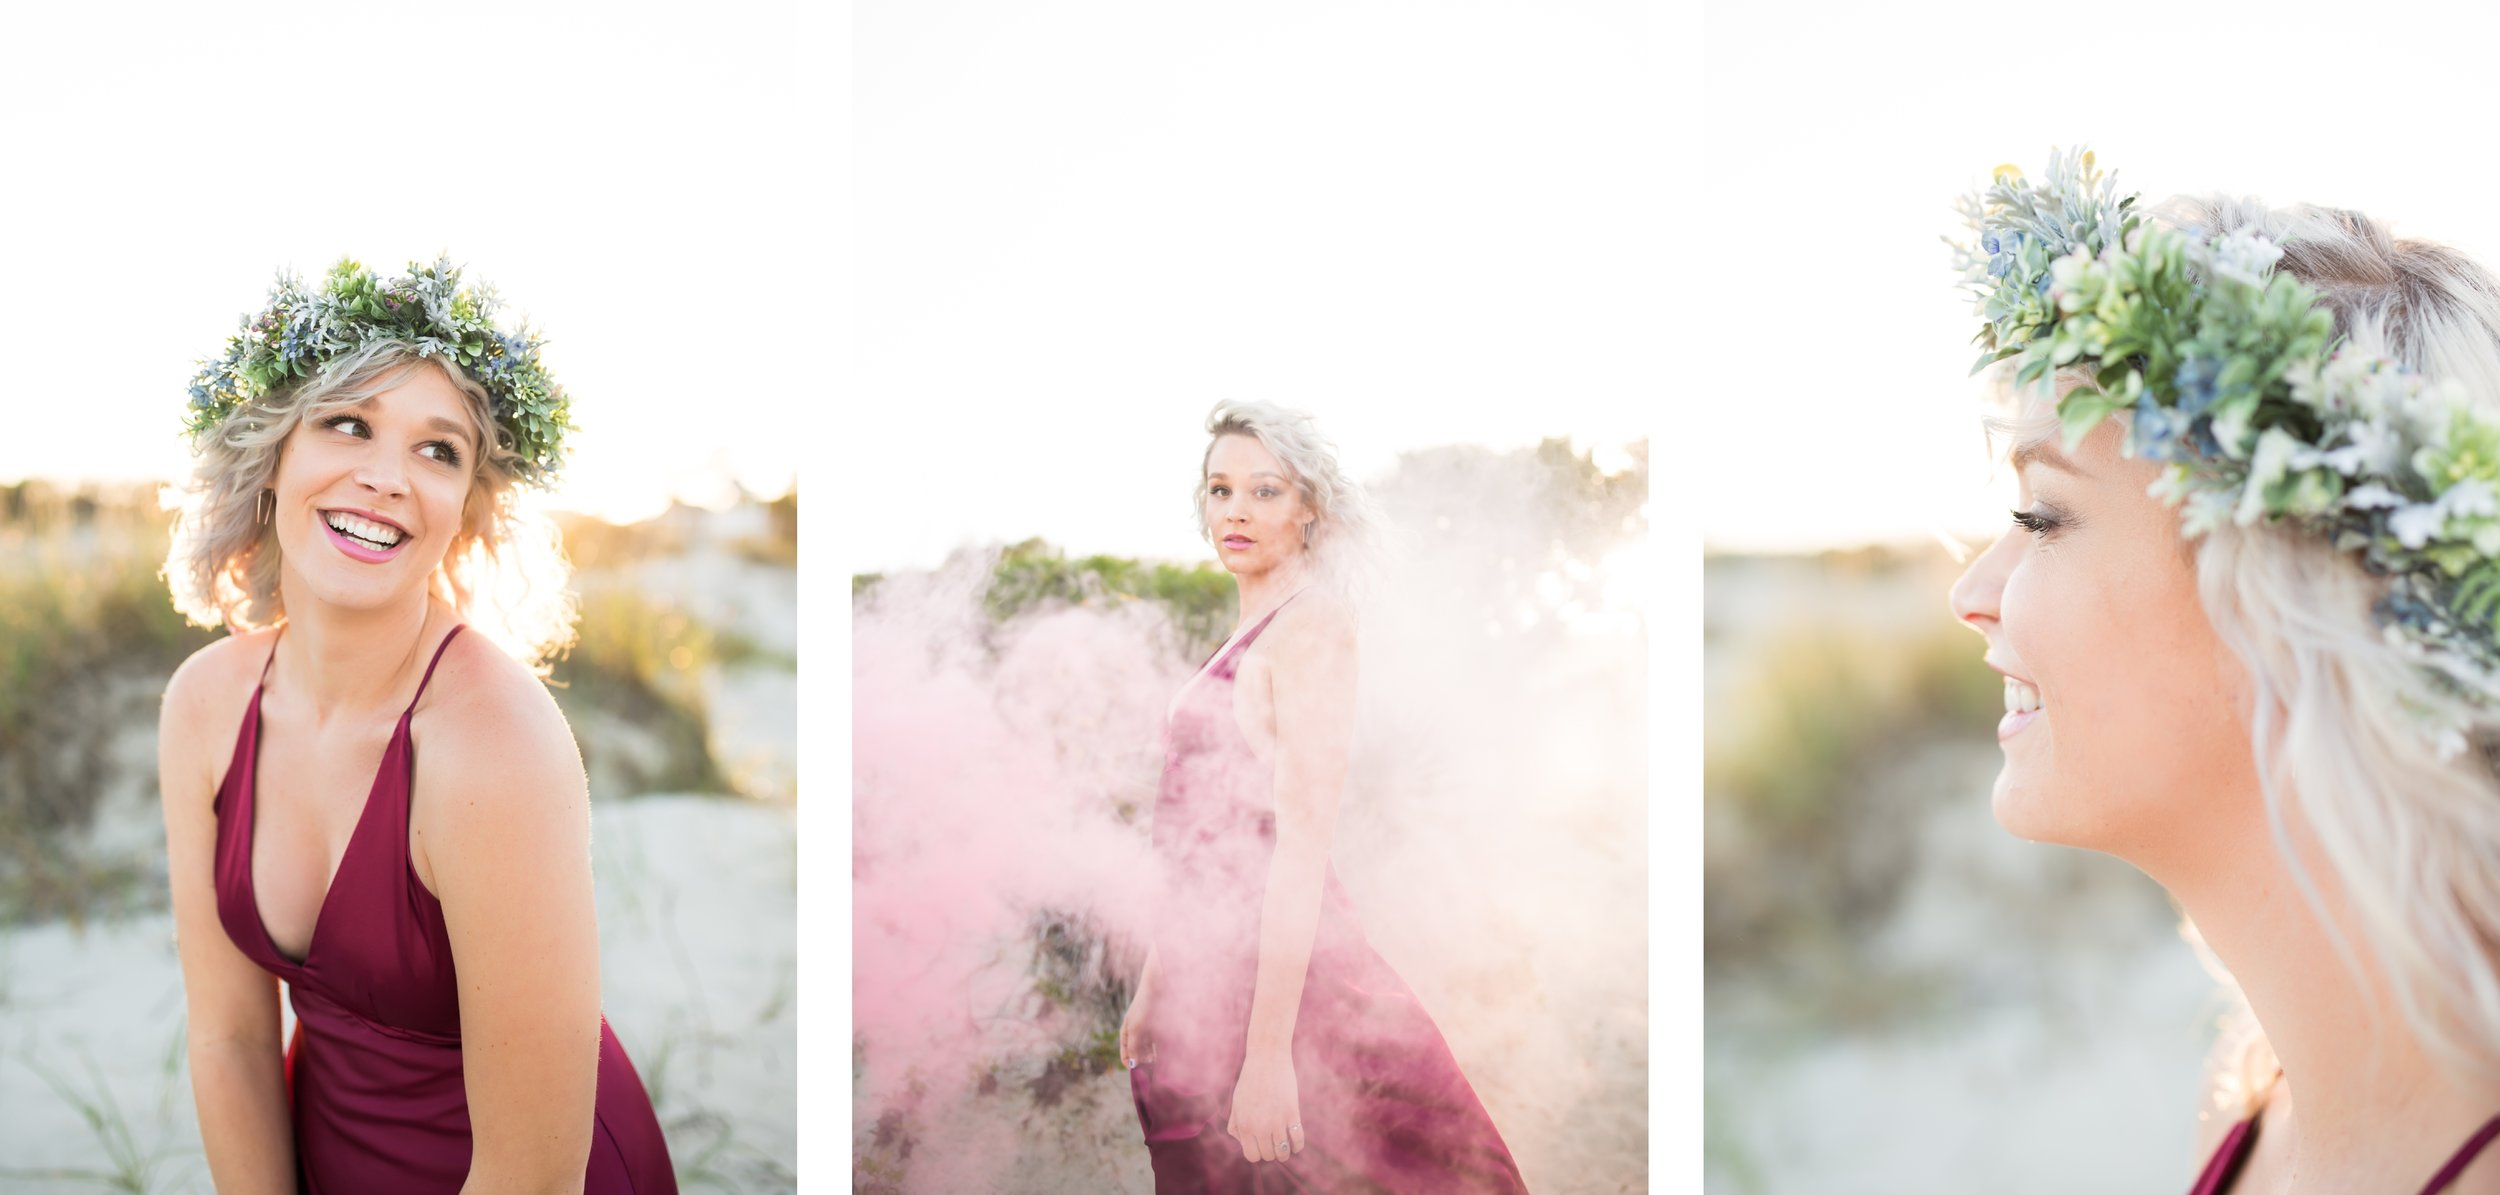 Rainey_Gregg_Photography_St._Simons_Island_Georgia_California_Wedding_Portrait_Photography_0249.jpg